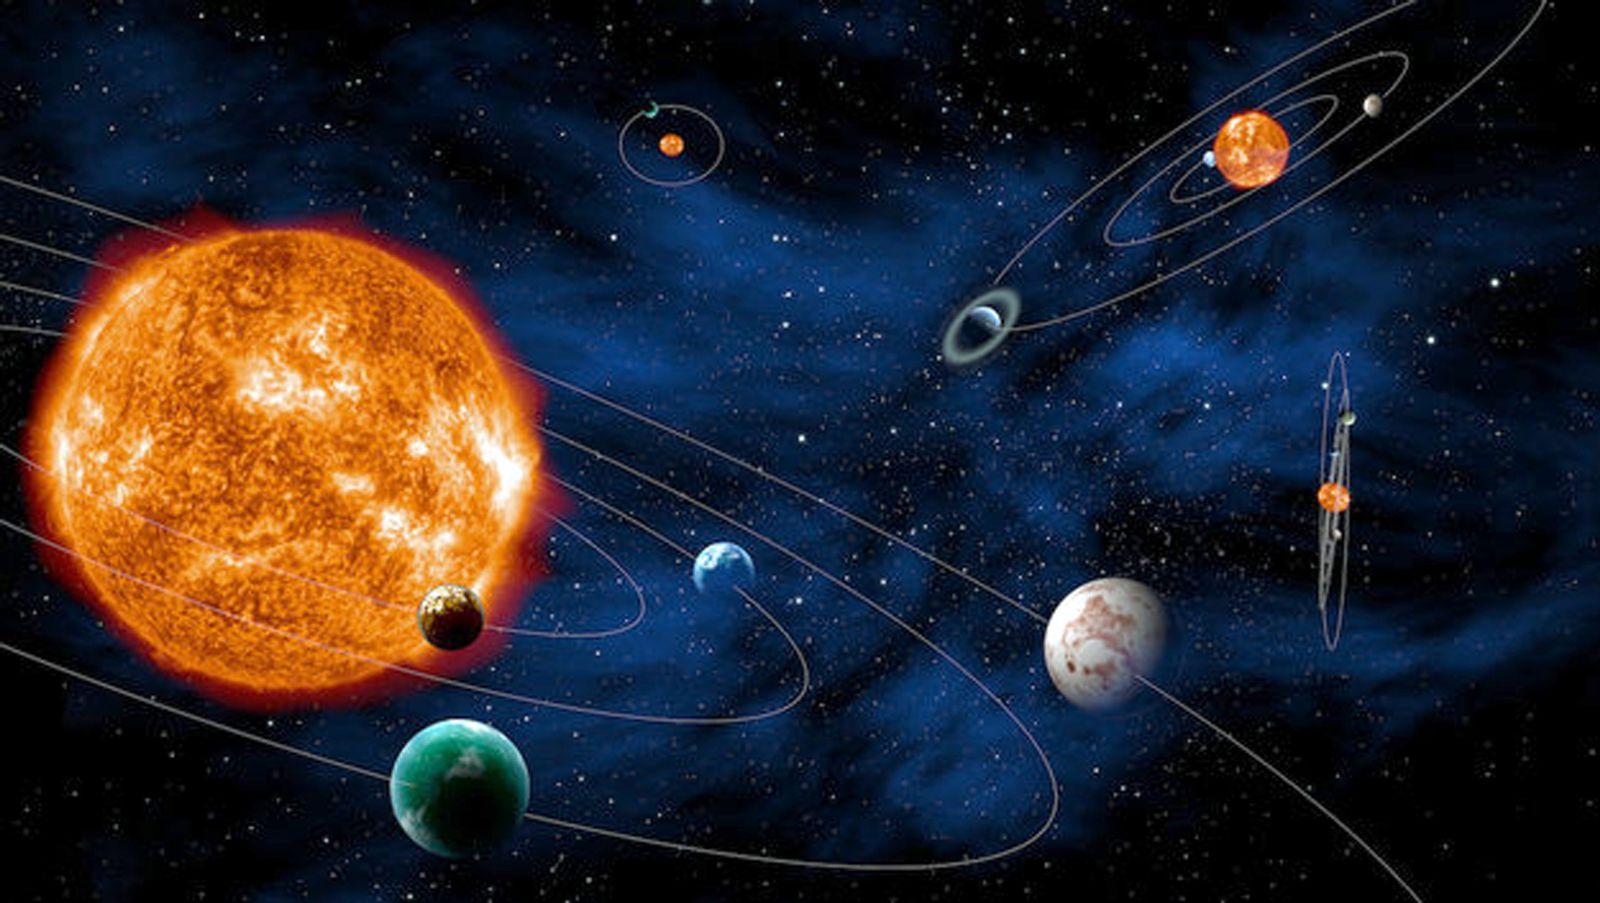 Exoplaneten / Plato / Esa